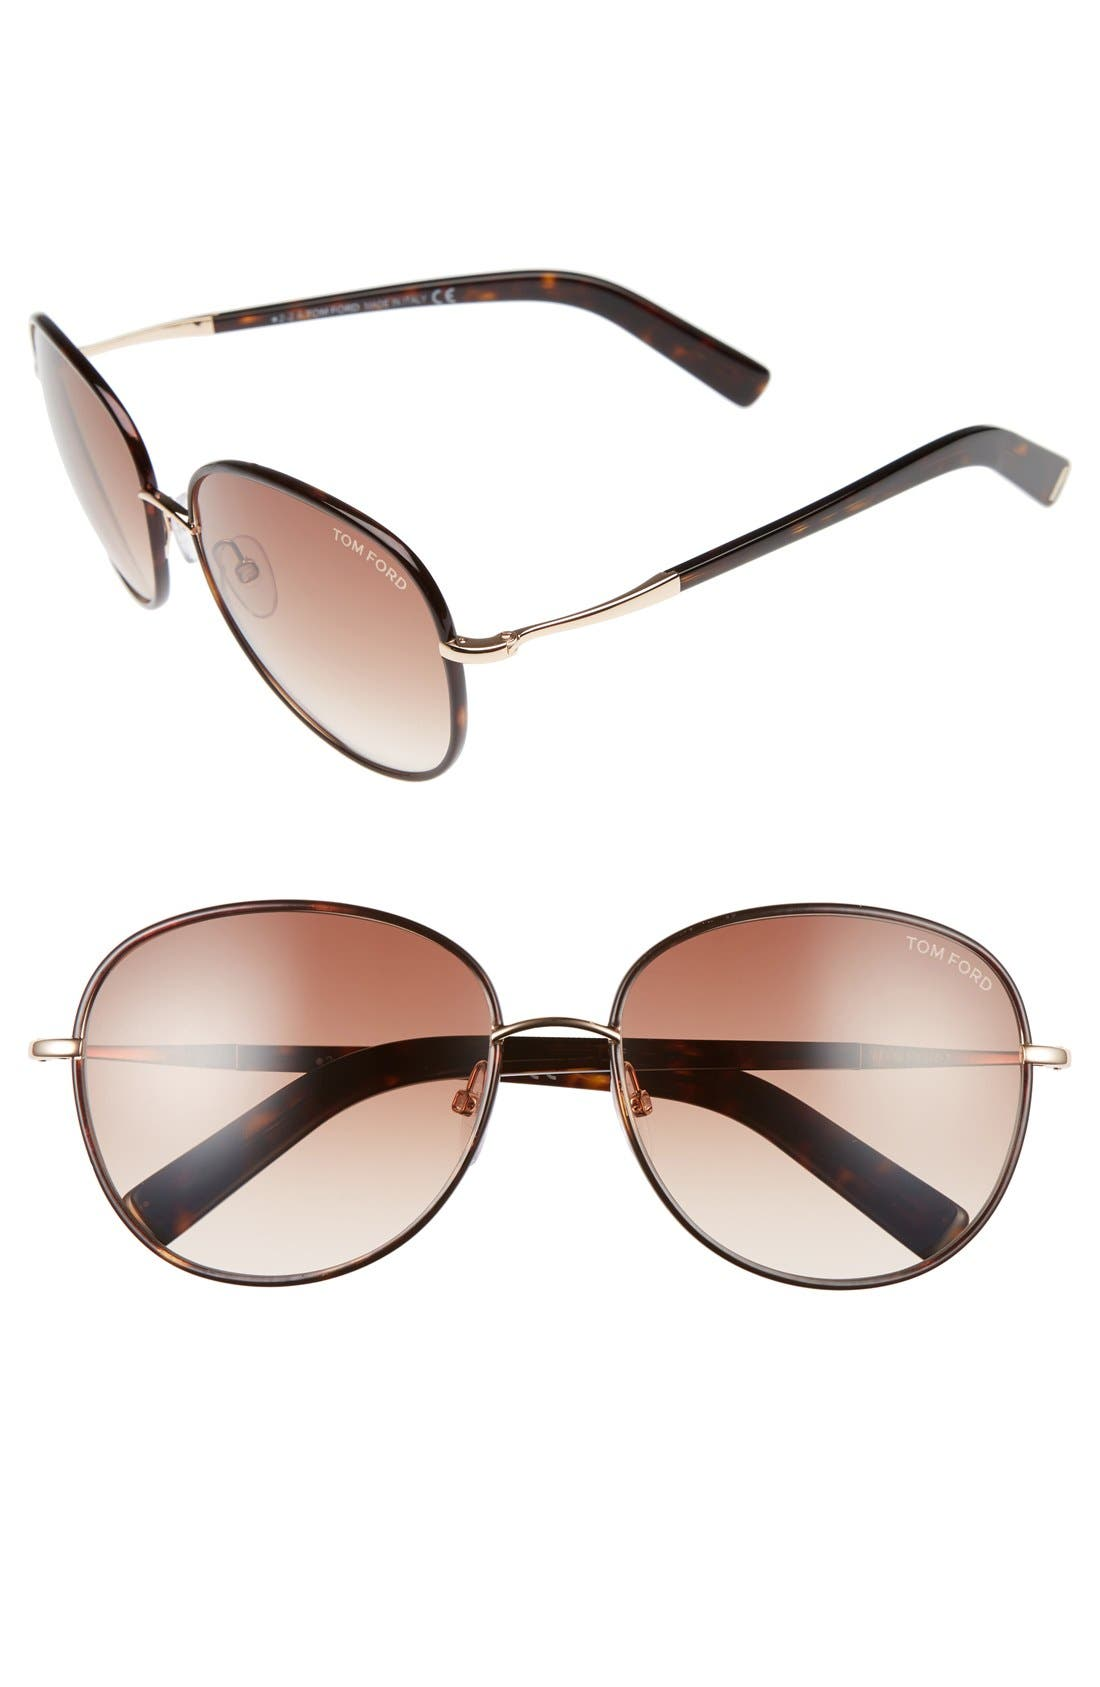 Main Image - Tom Ford Georgia 59mm Sunglasses